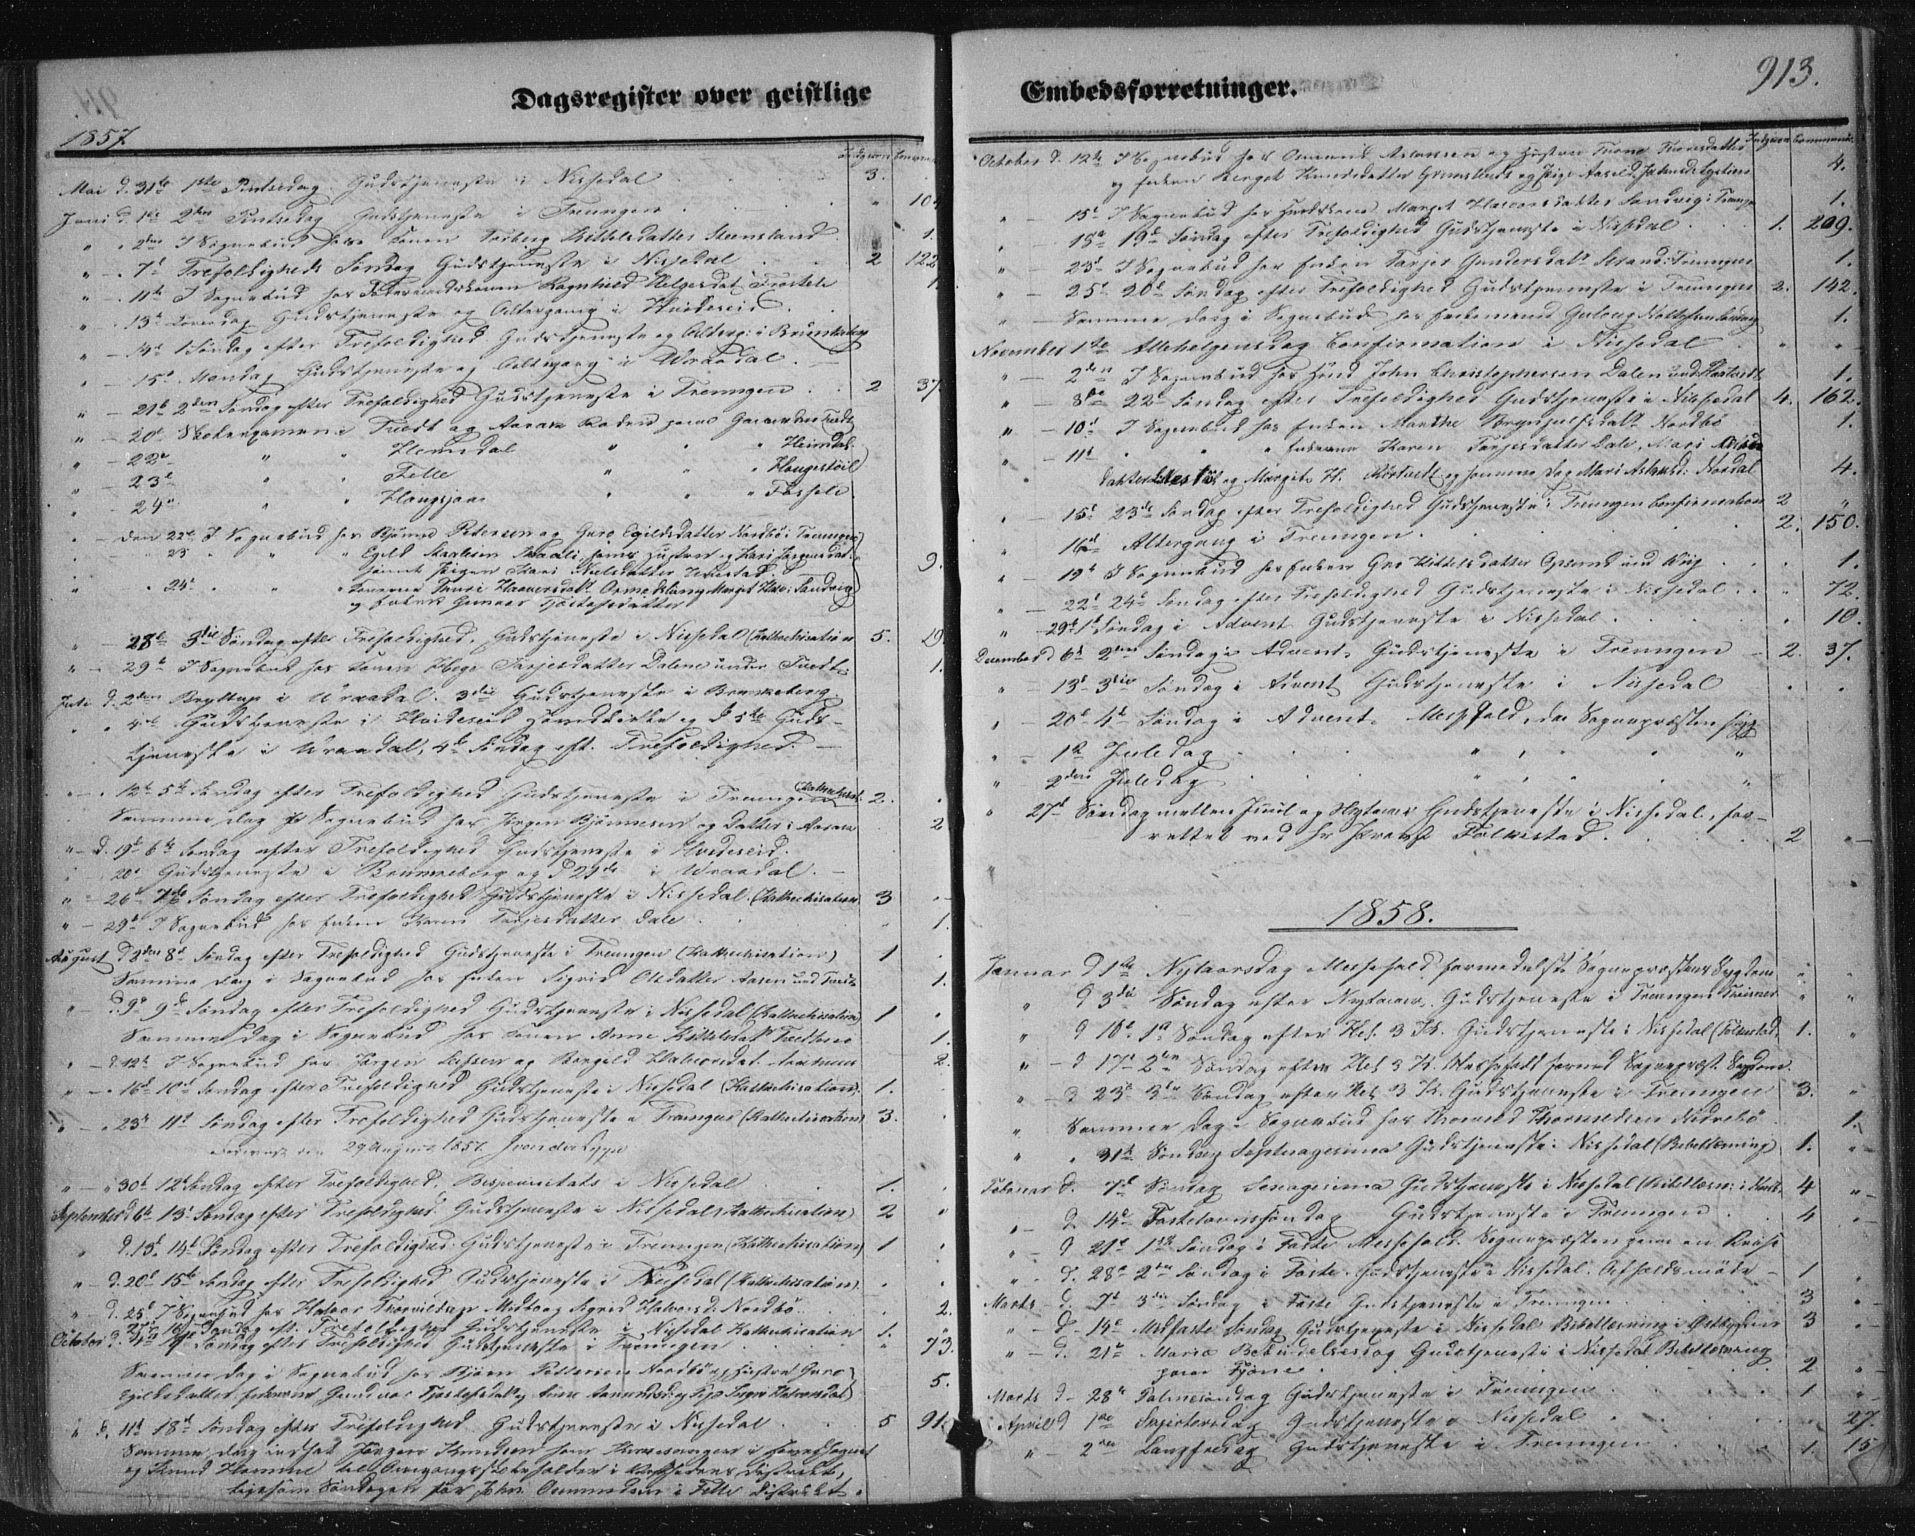 SAKO, Nissedal kirkebøker, F/Fa/L0003: Ministerialbok nr. I 3, 1846-1870, s. 912-913